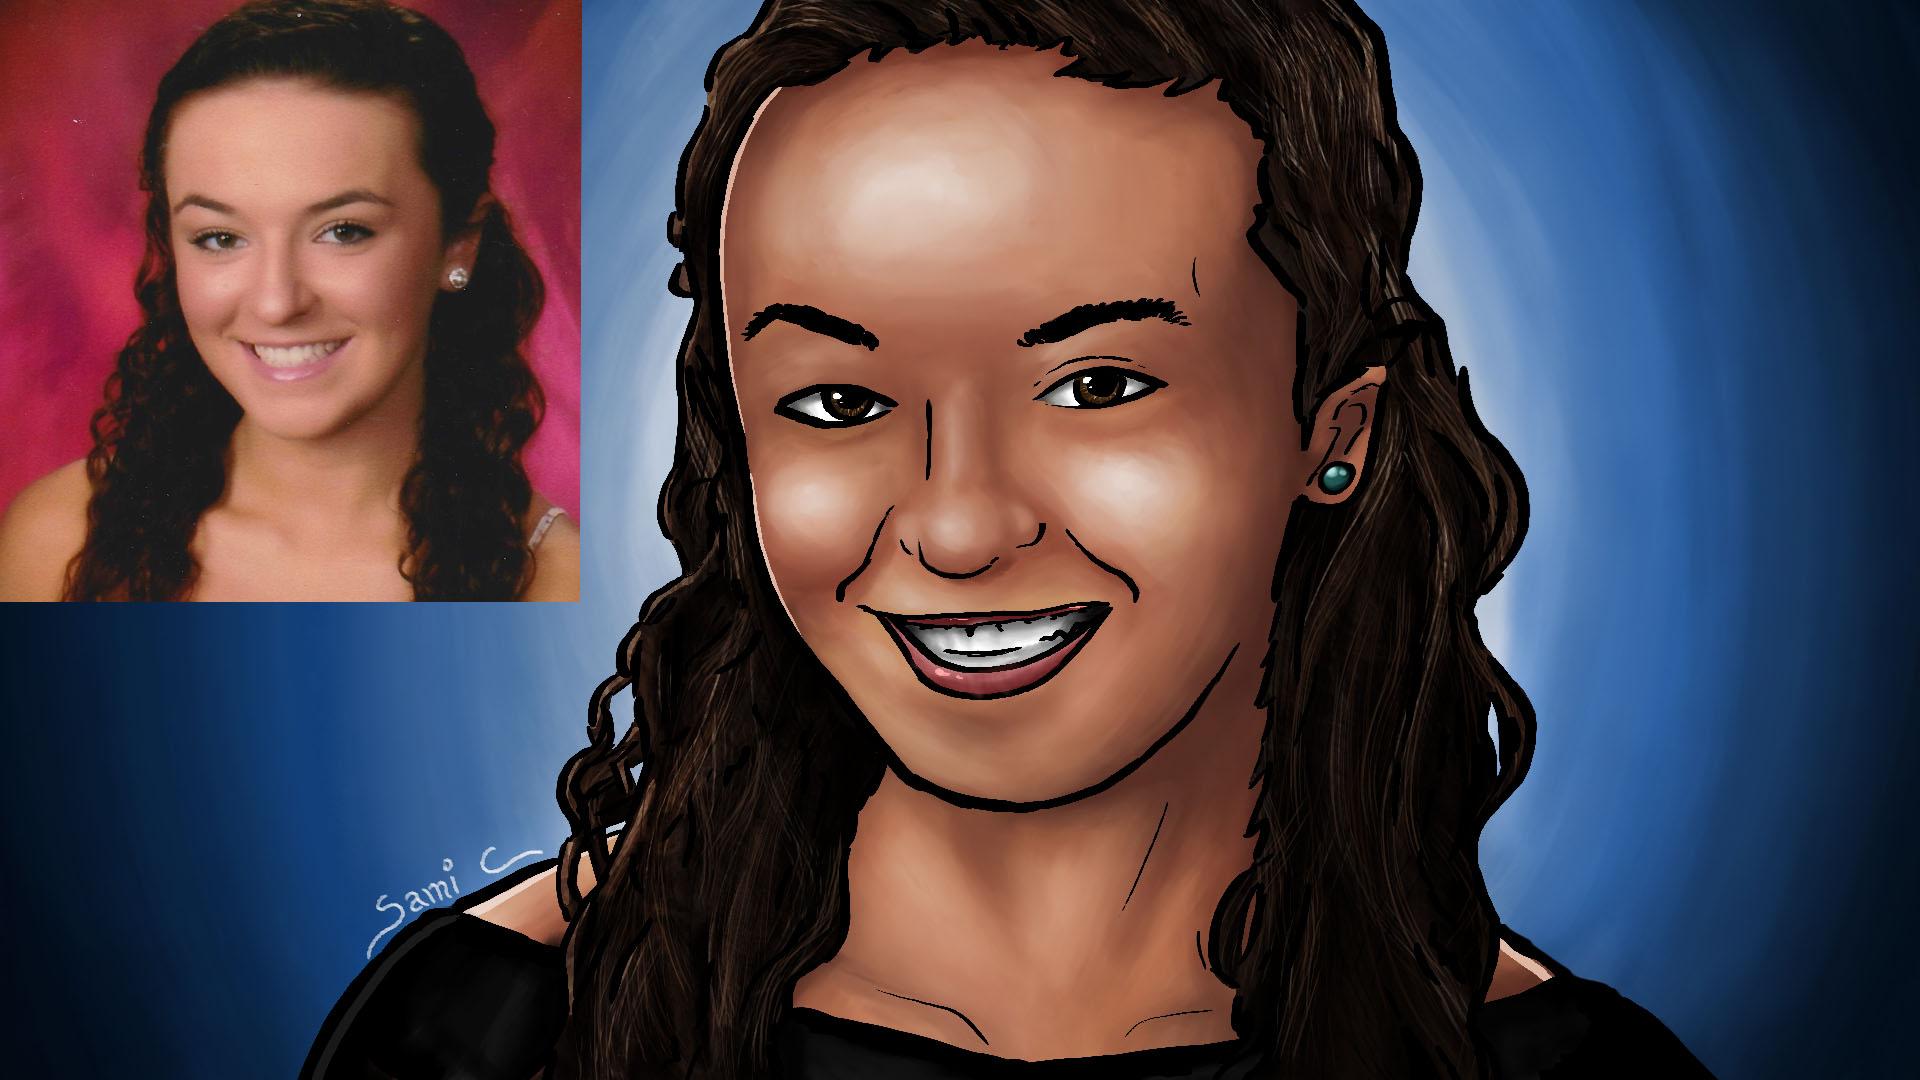 Commissioned Digital Portrait